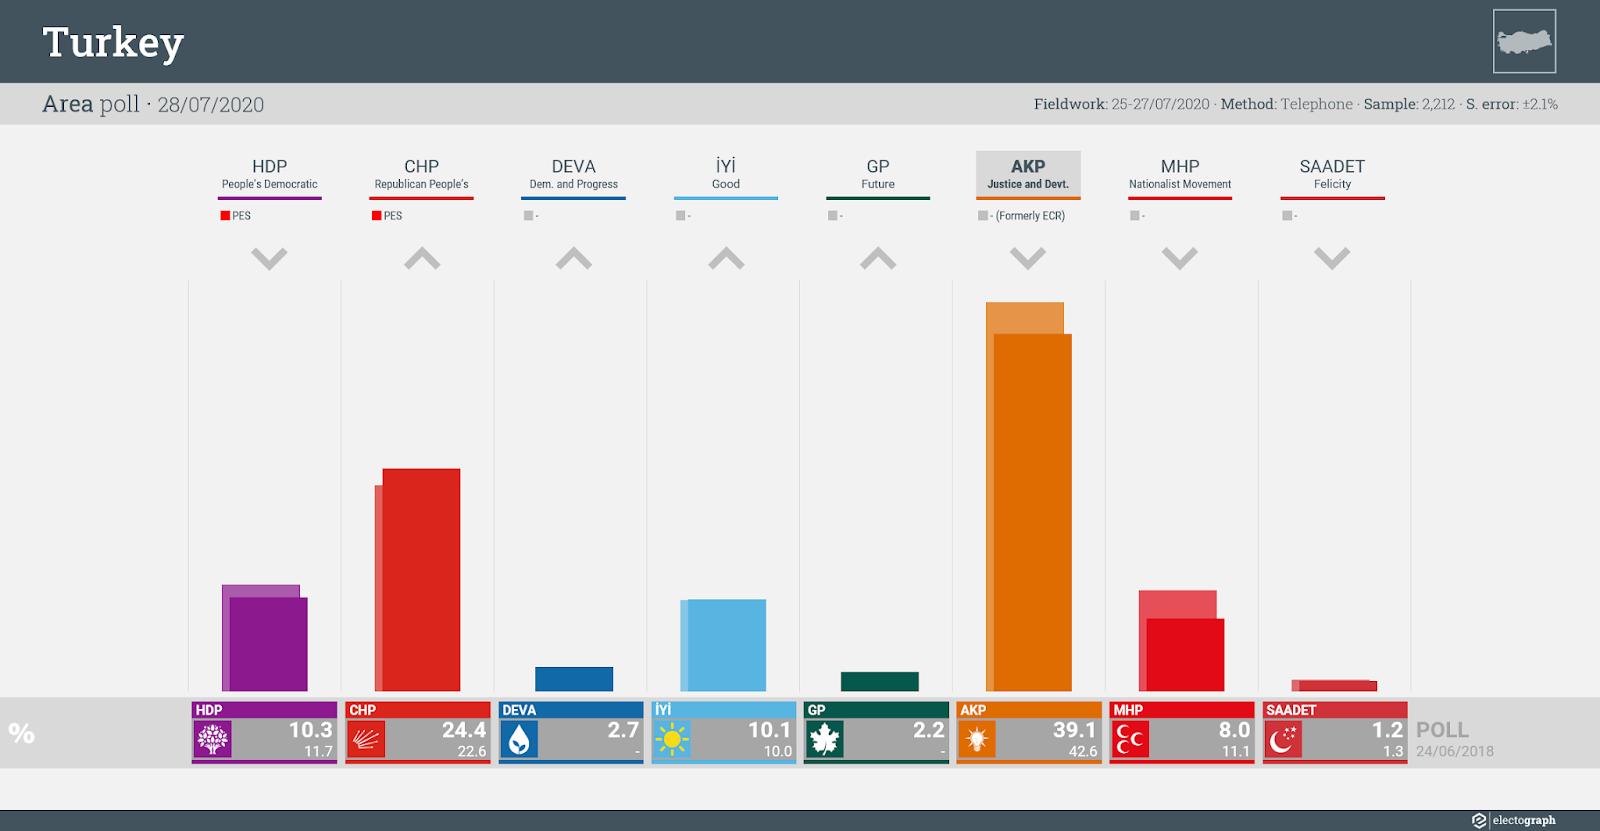 TURKEY: Area poll chart, 28 July 2020